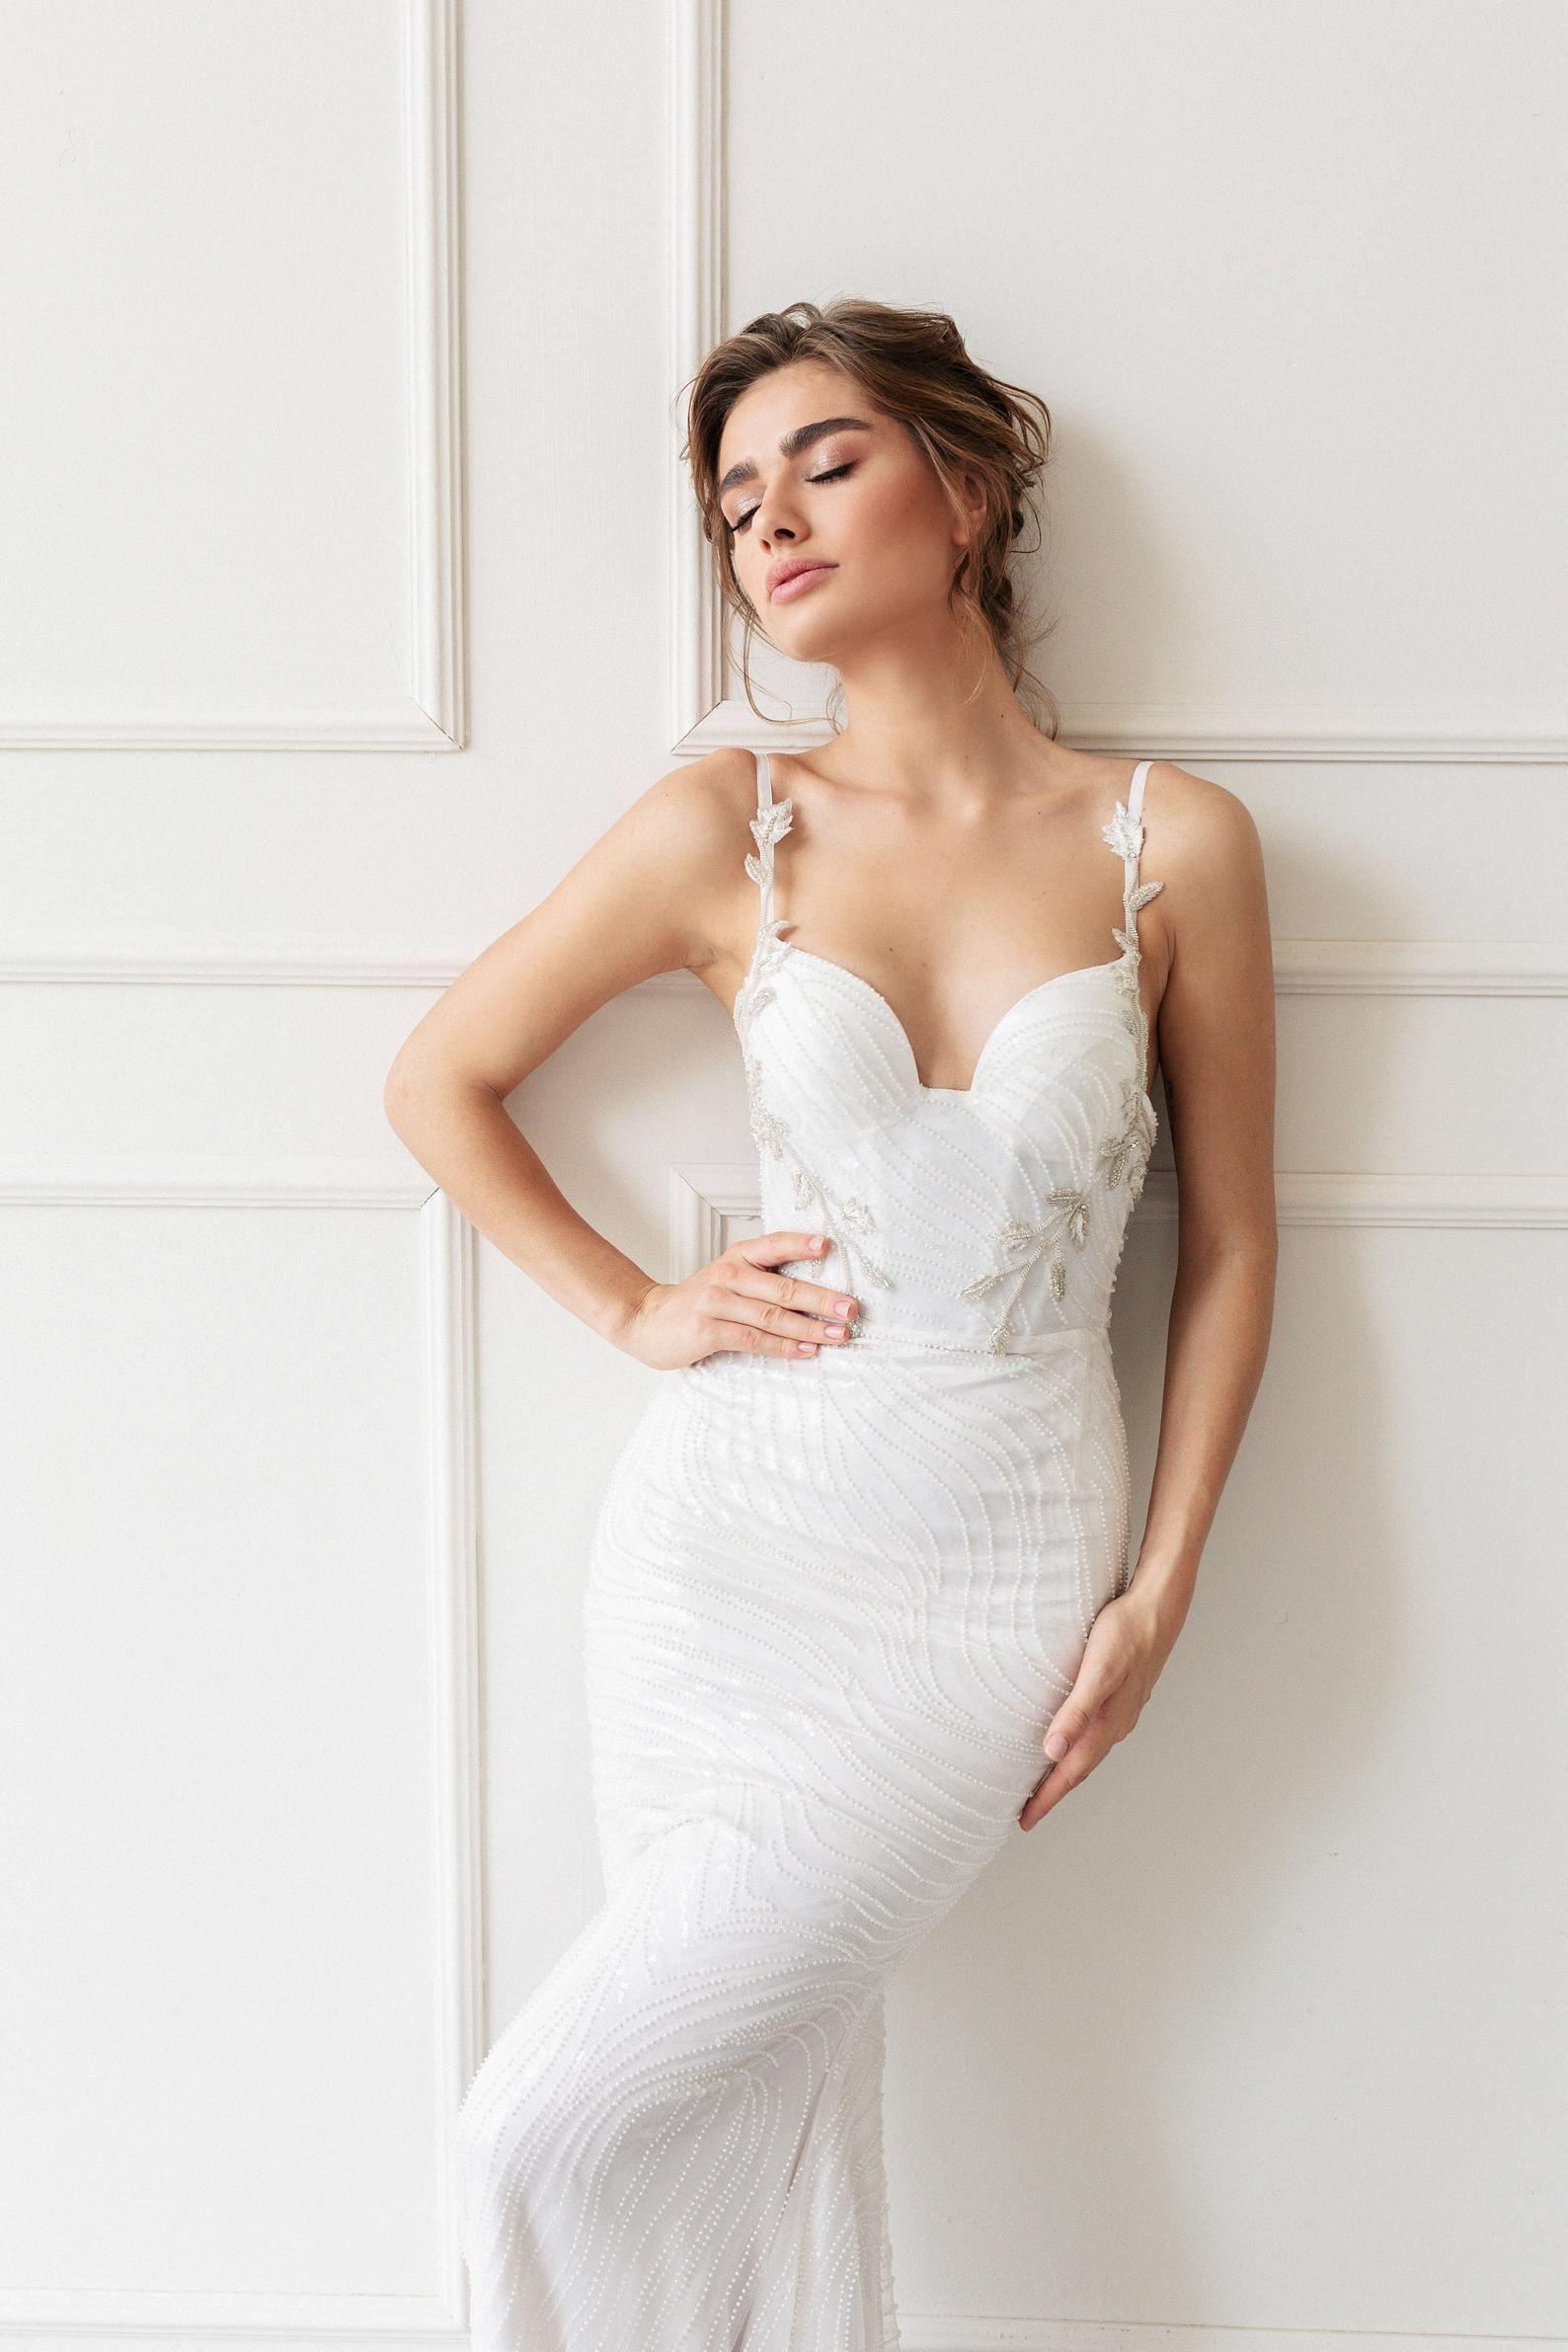 Wedding Dress Airin With Long Train By Ange Etoiles Mermaid Etsy Petite Wedding Dress Top Wedding Dresses Simple Elegant Wedding Dress [ 2382 x 1588 Pixel ]